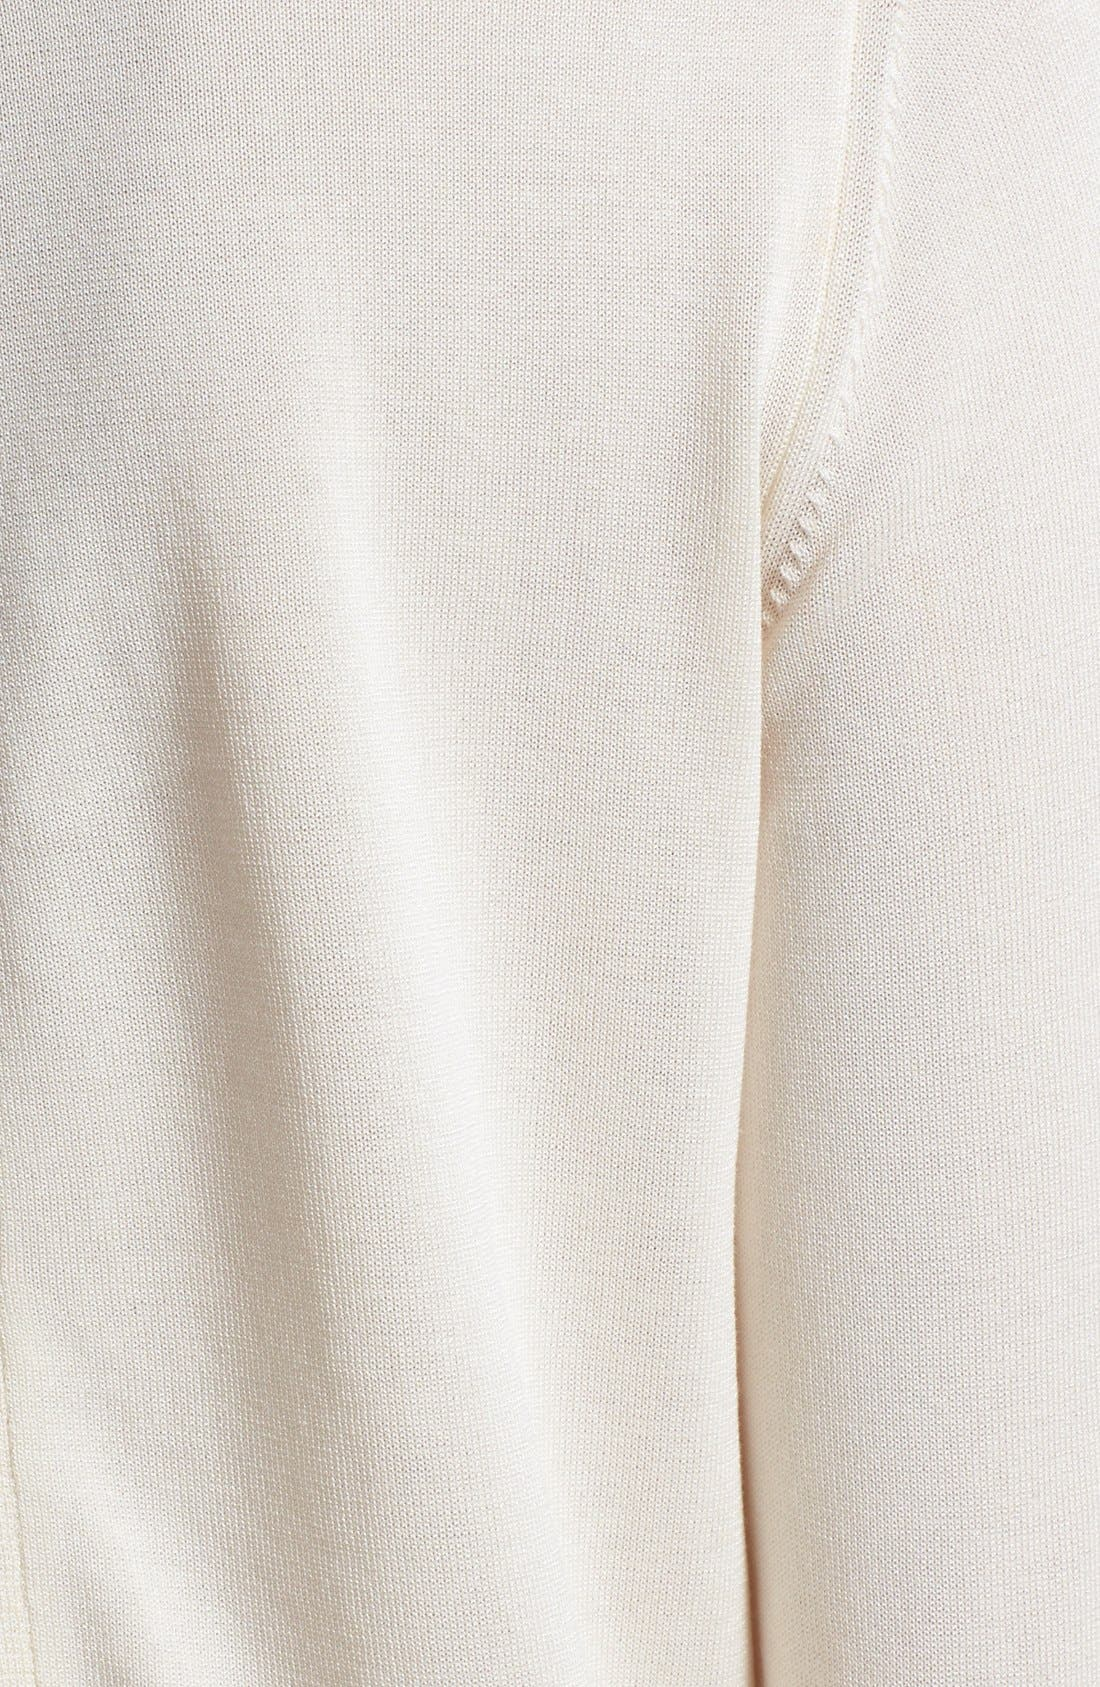 'Maglia' Tricot Button Cardigan,                             Alternate thumbnail 2, color,                             100